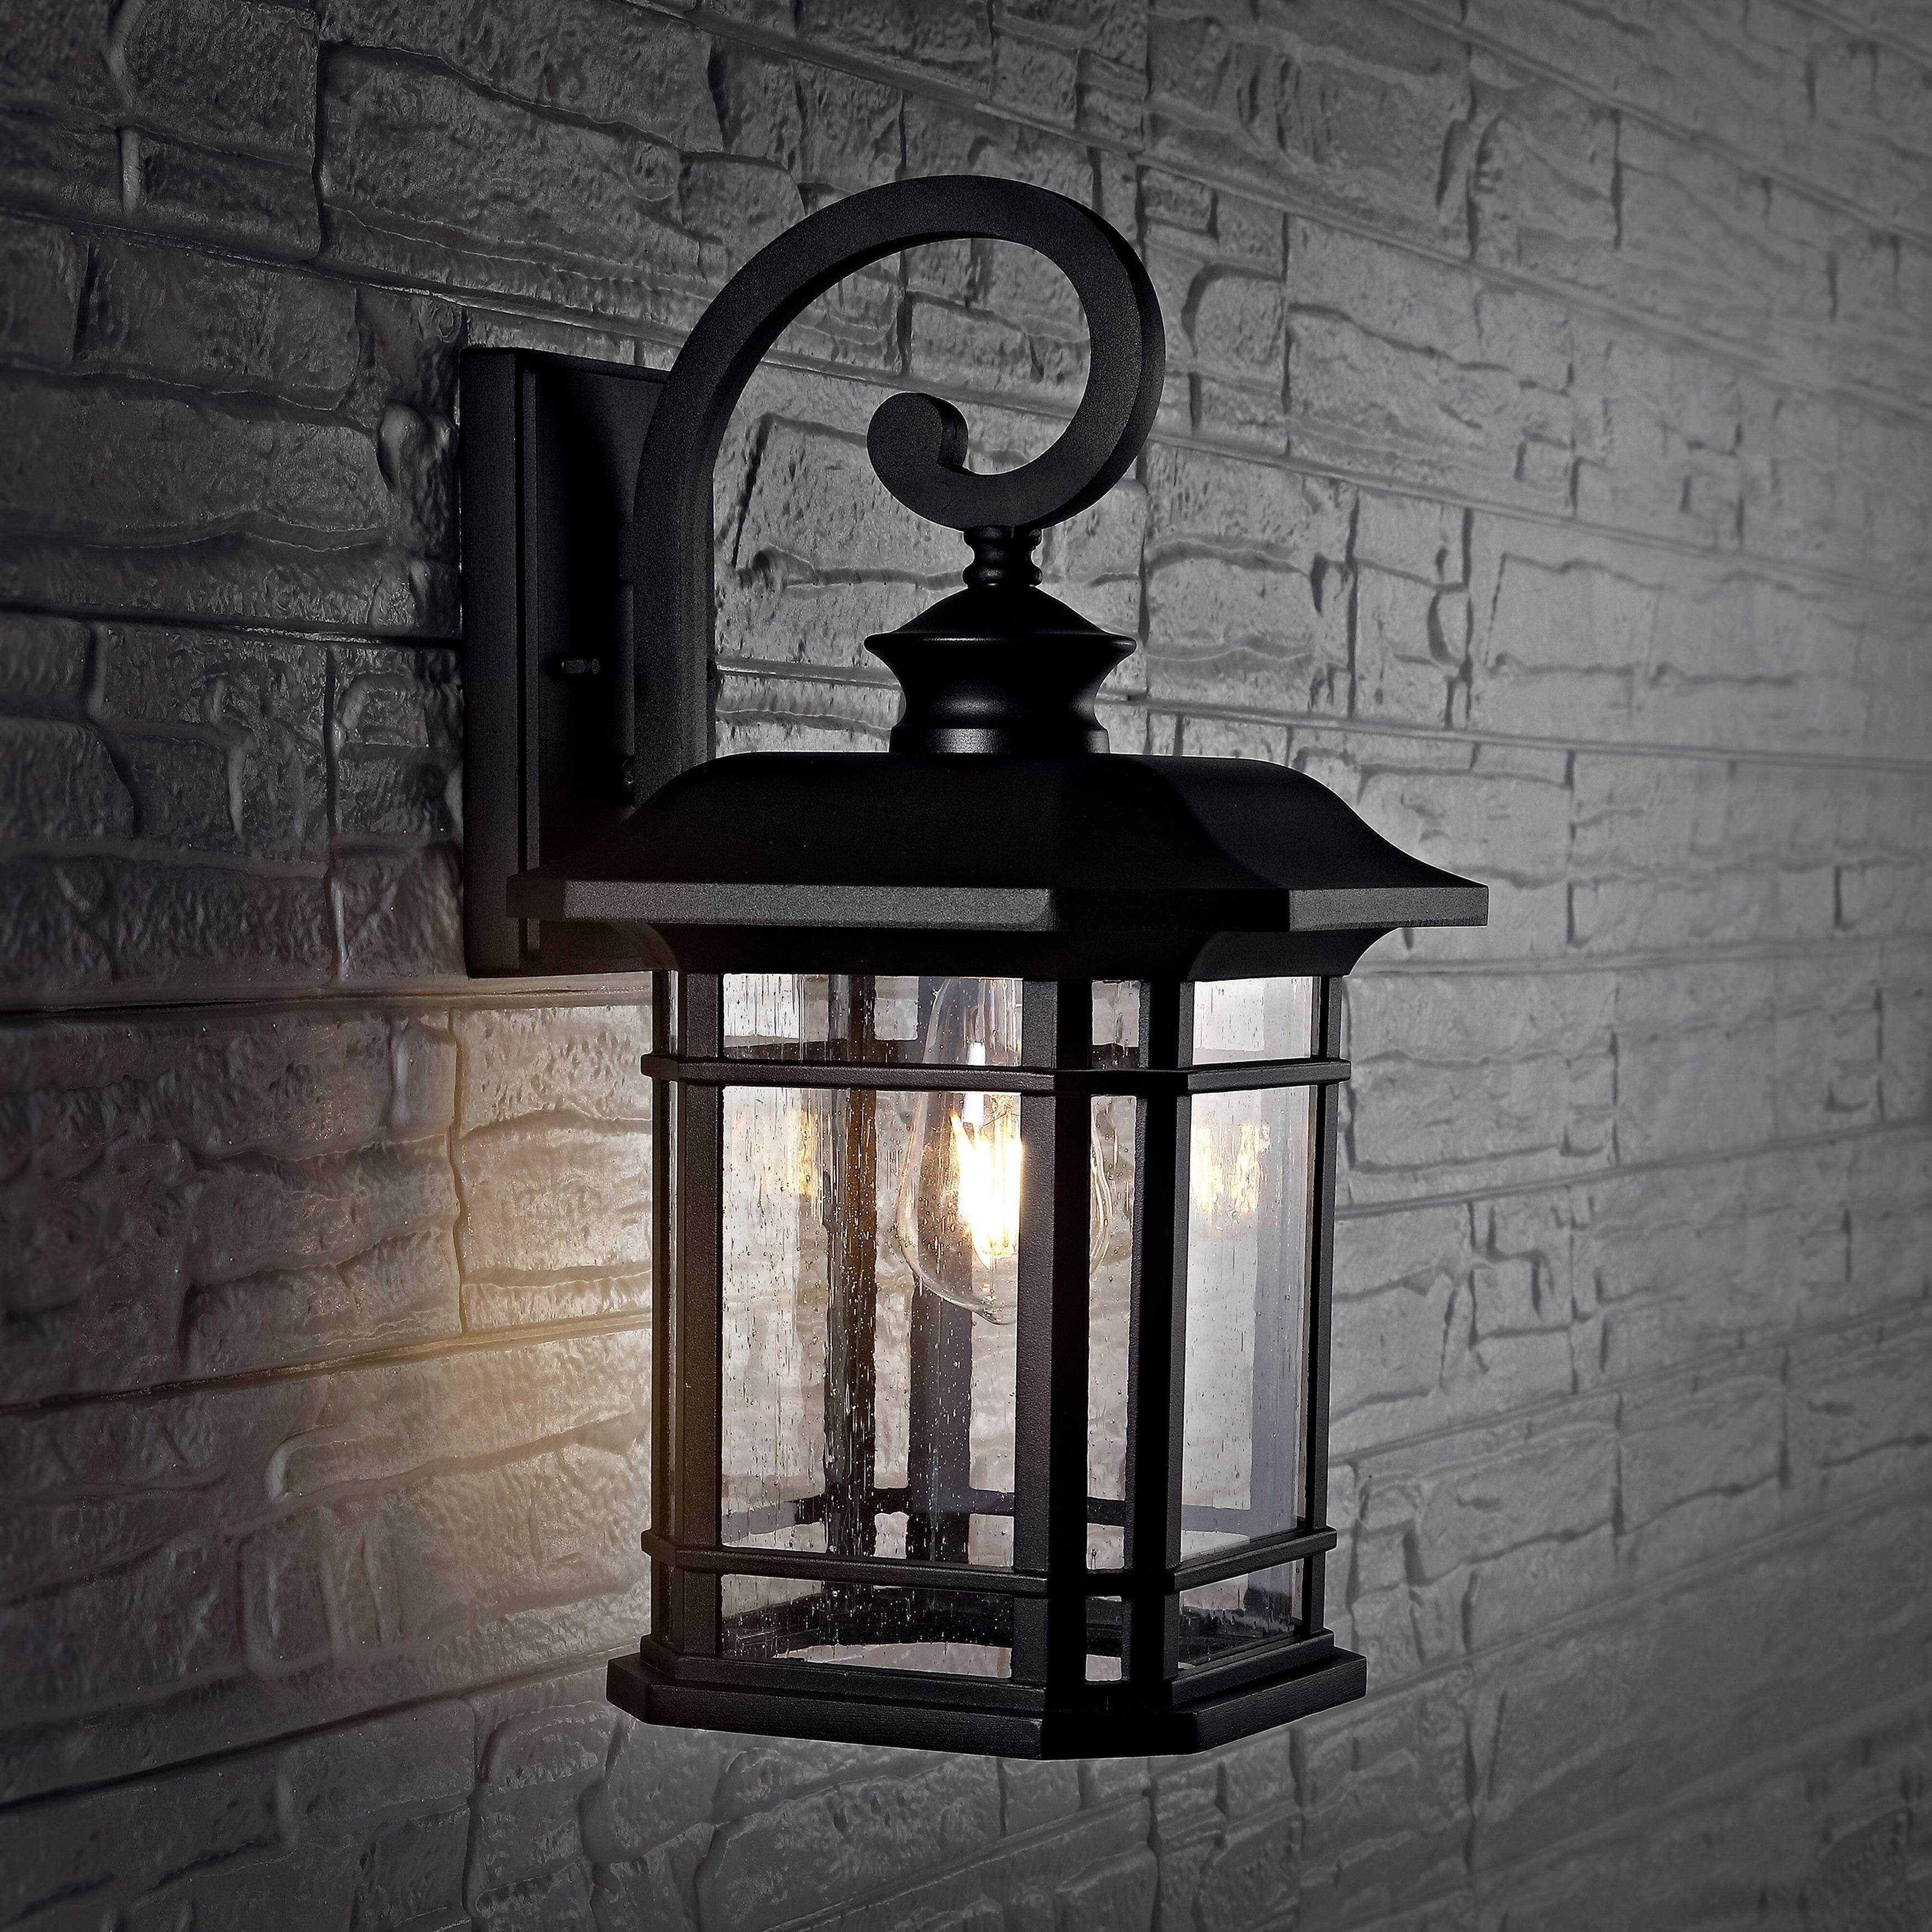 Safavieh Cendra Outdoor Wall Lantern 9 3 X10 3 X17 Overstock 29890242